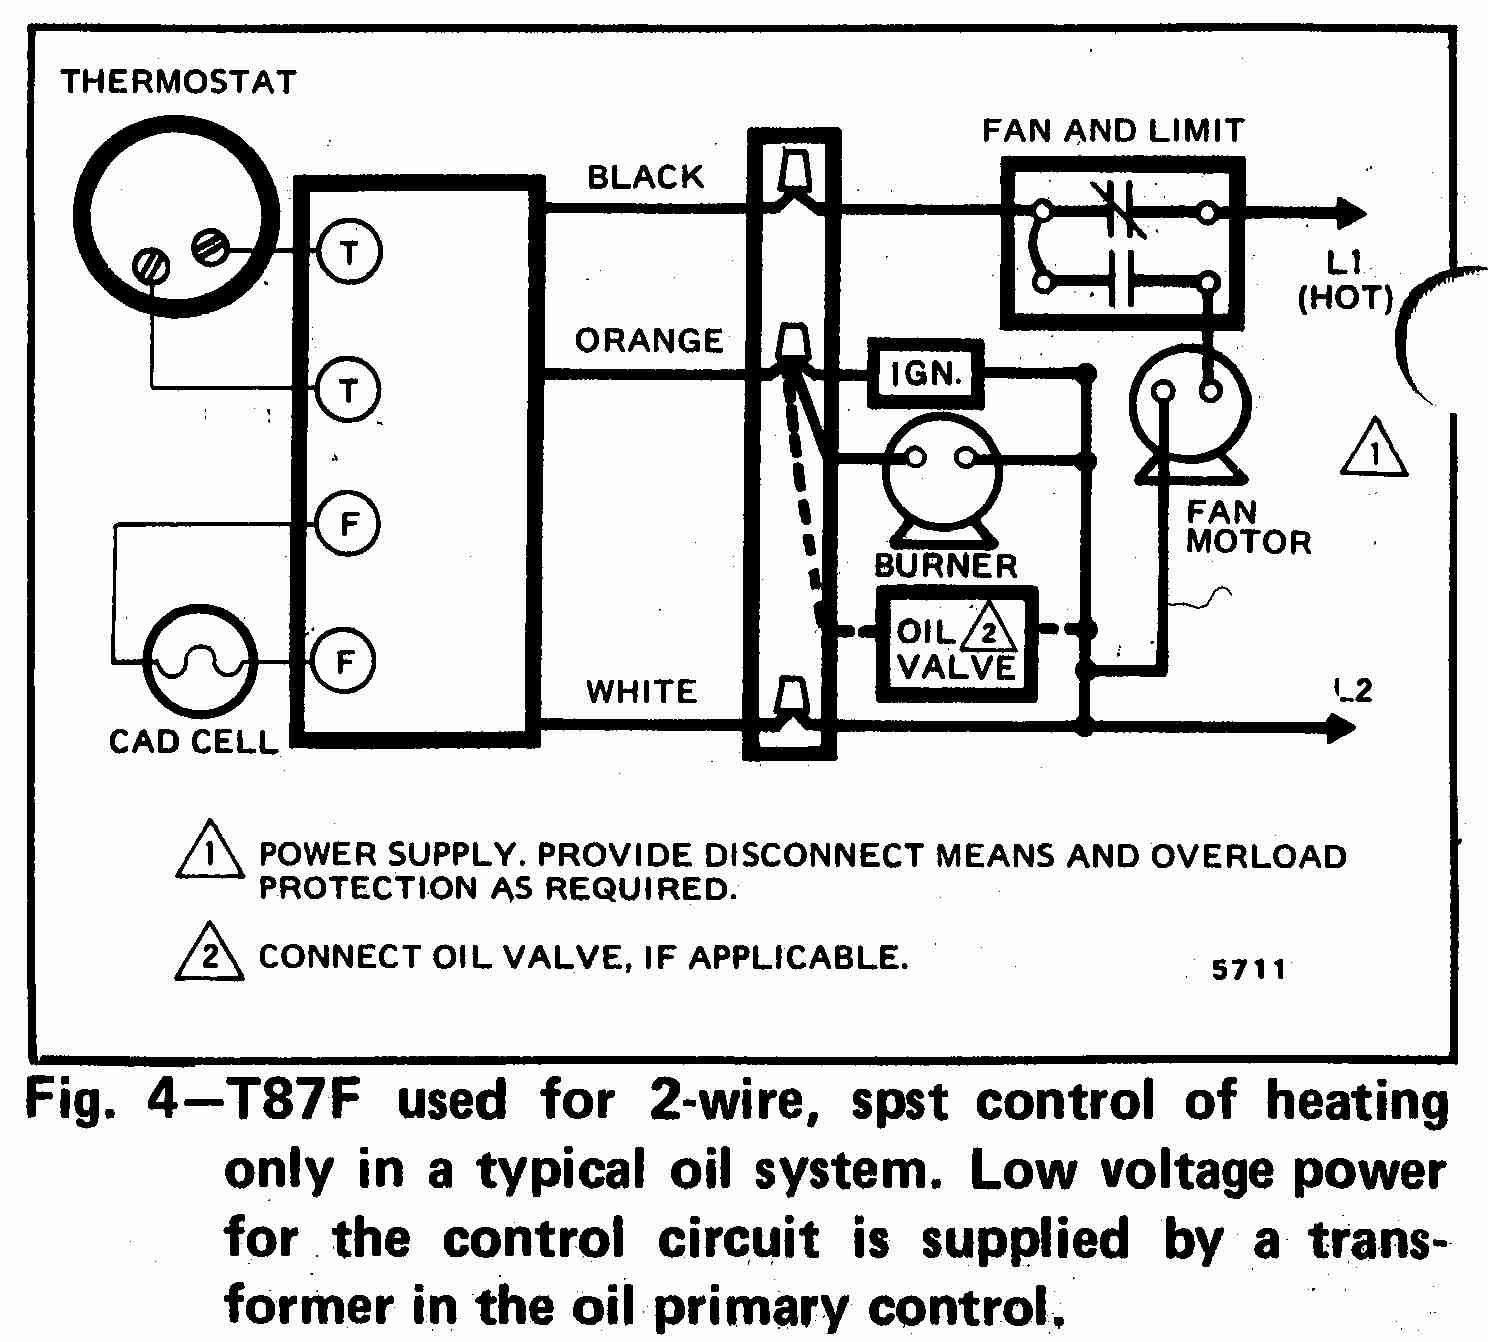 Honeywell S8610u Wiring Diagram Thermostat Wiring Hvac System Wire